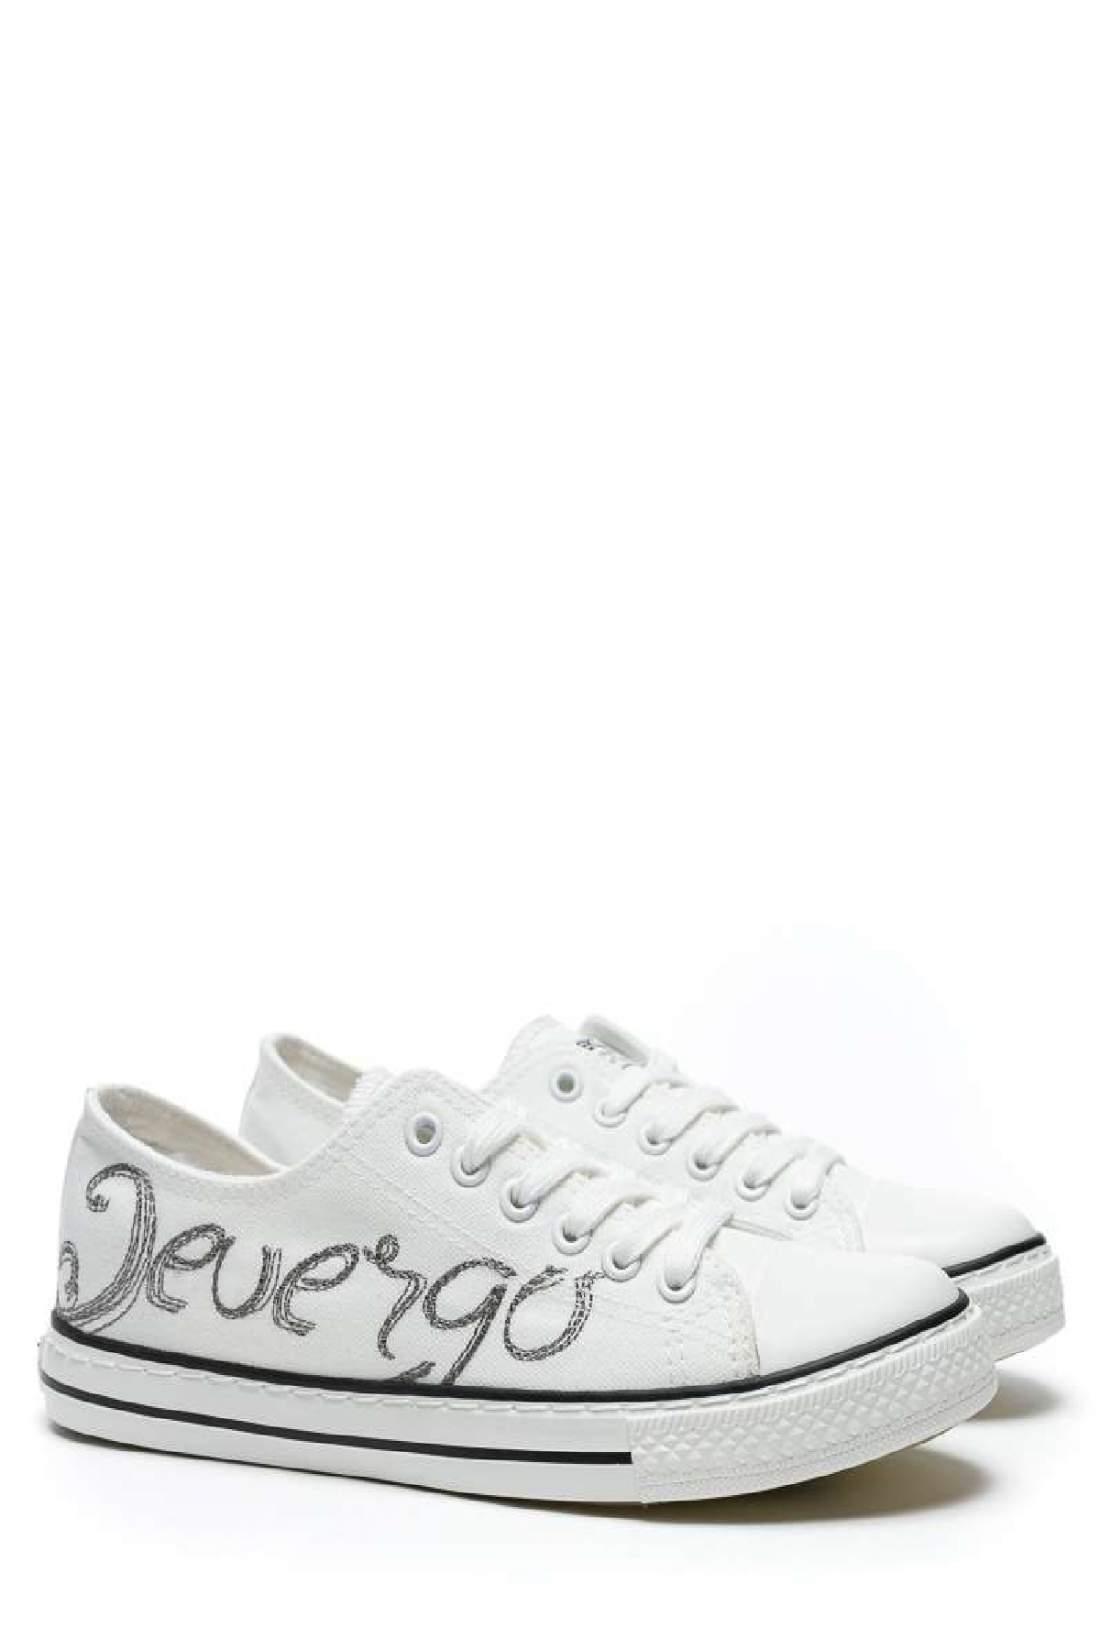 Devergo AMILLA LOGO női tornacipő - Fehér